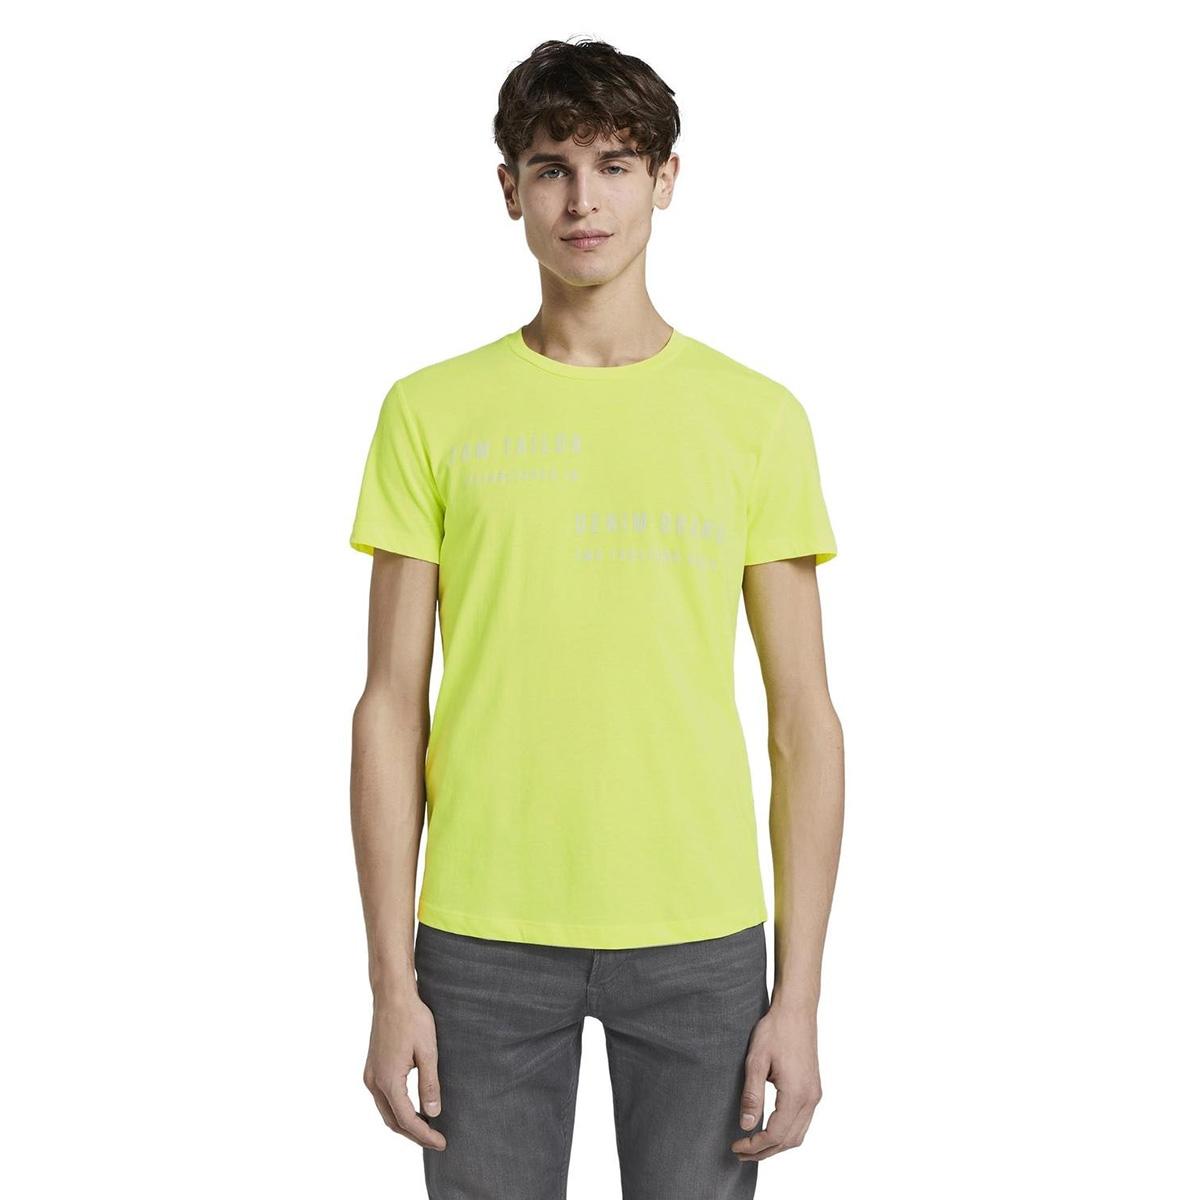 t shirt met print 1016823xx12 tom tailor t-shirt 20361